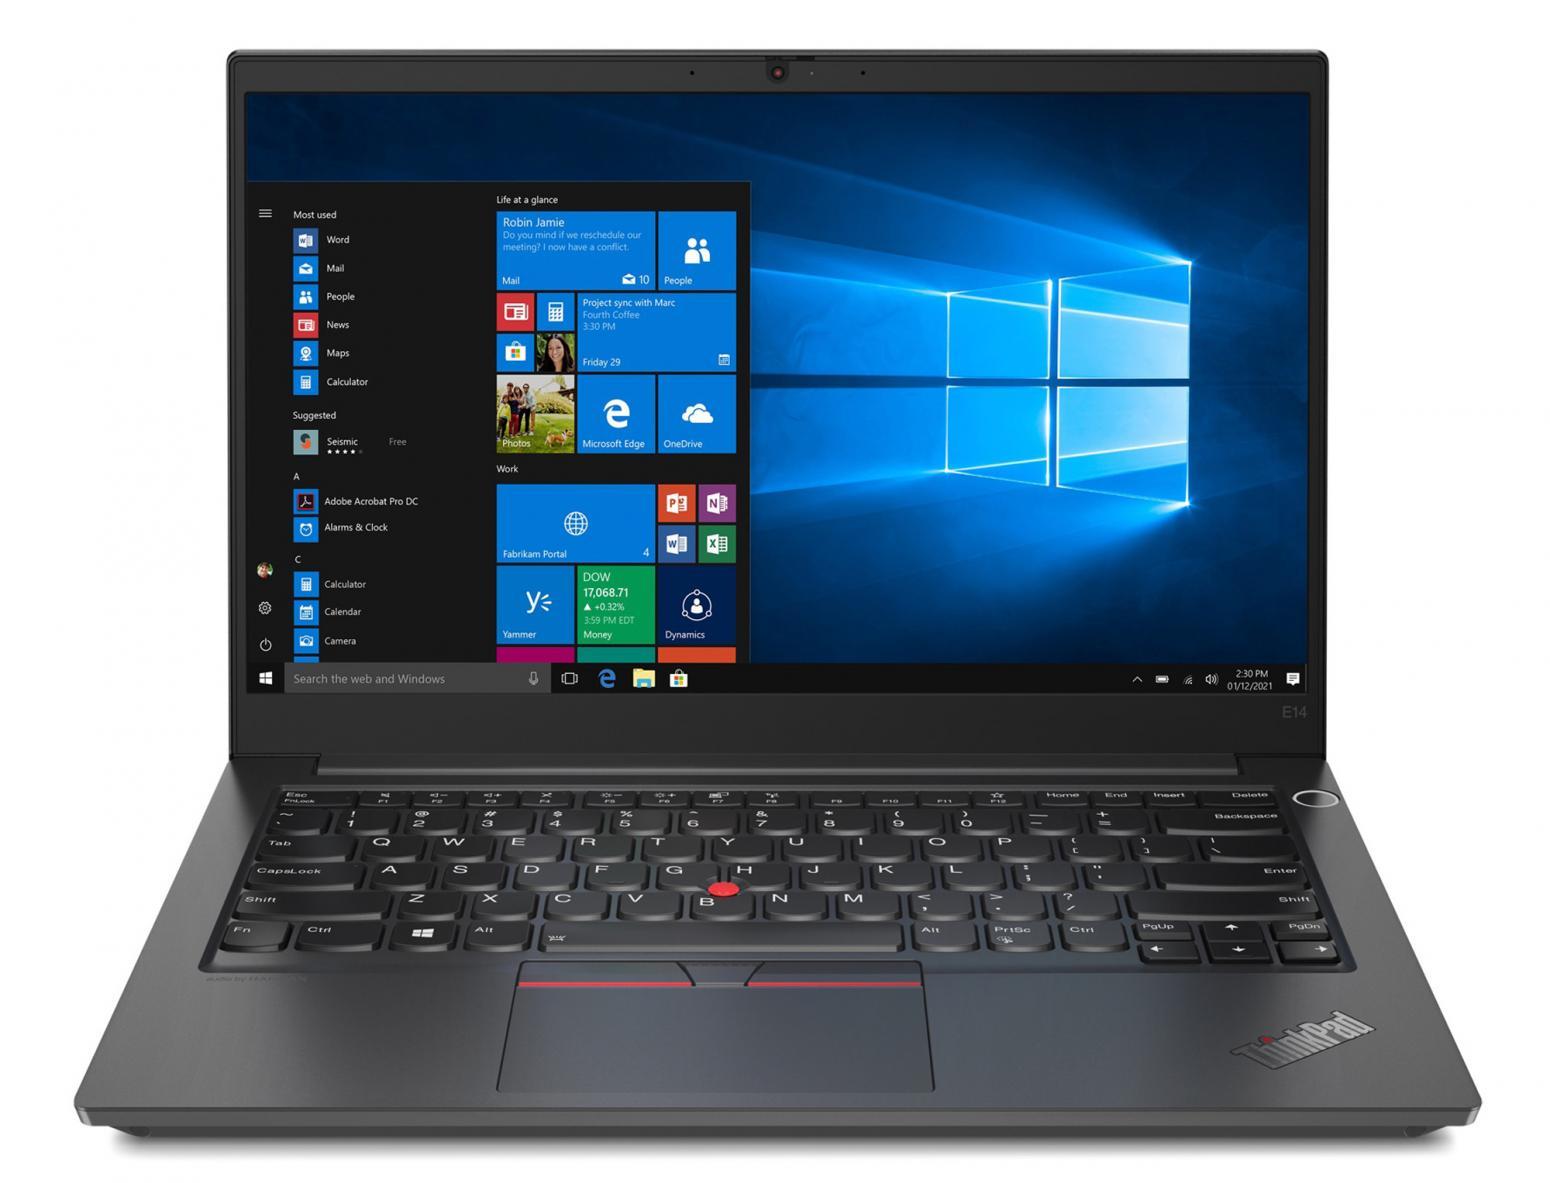 Ordinateur portable Lenovo ThinkPad E14 AMD Gen 3 (20Y7003RFR) Argent - Ryzen 5, Pro - photo 9